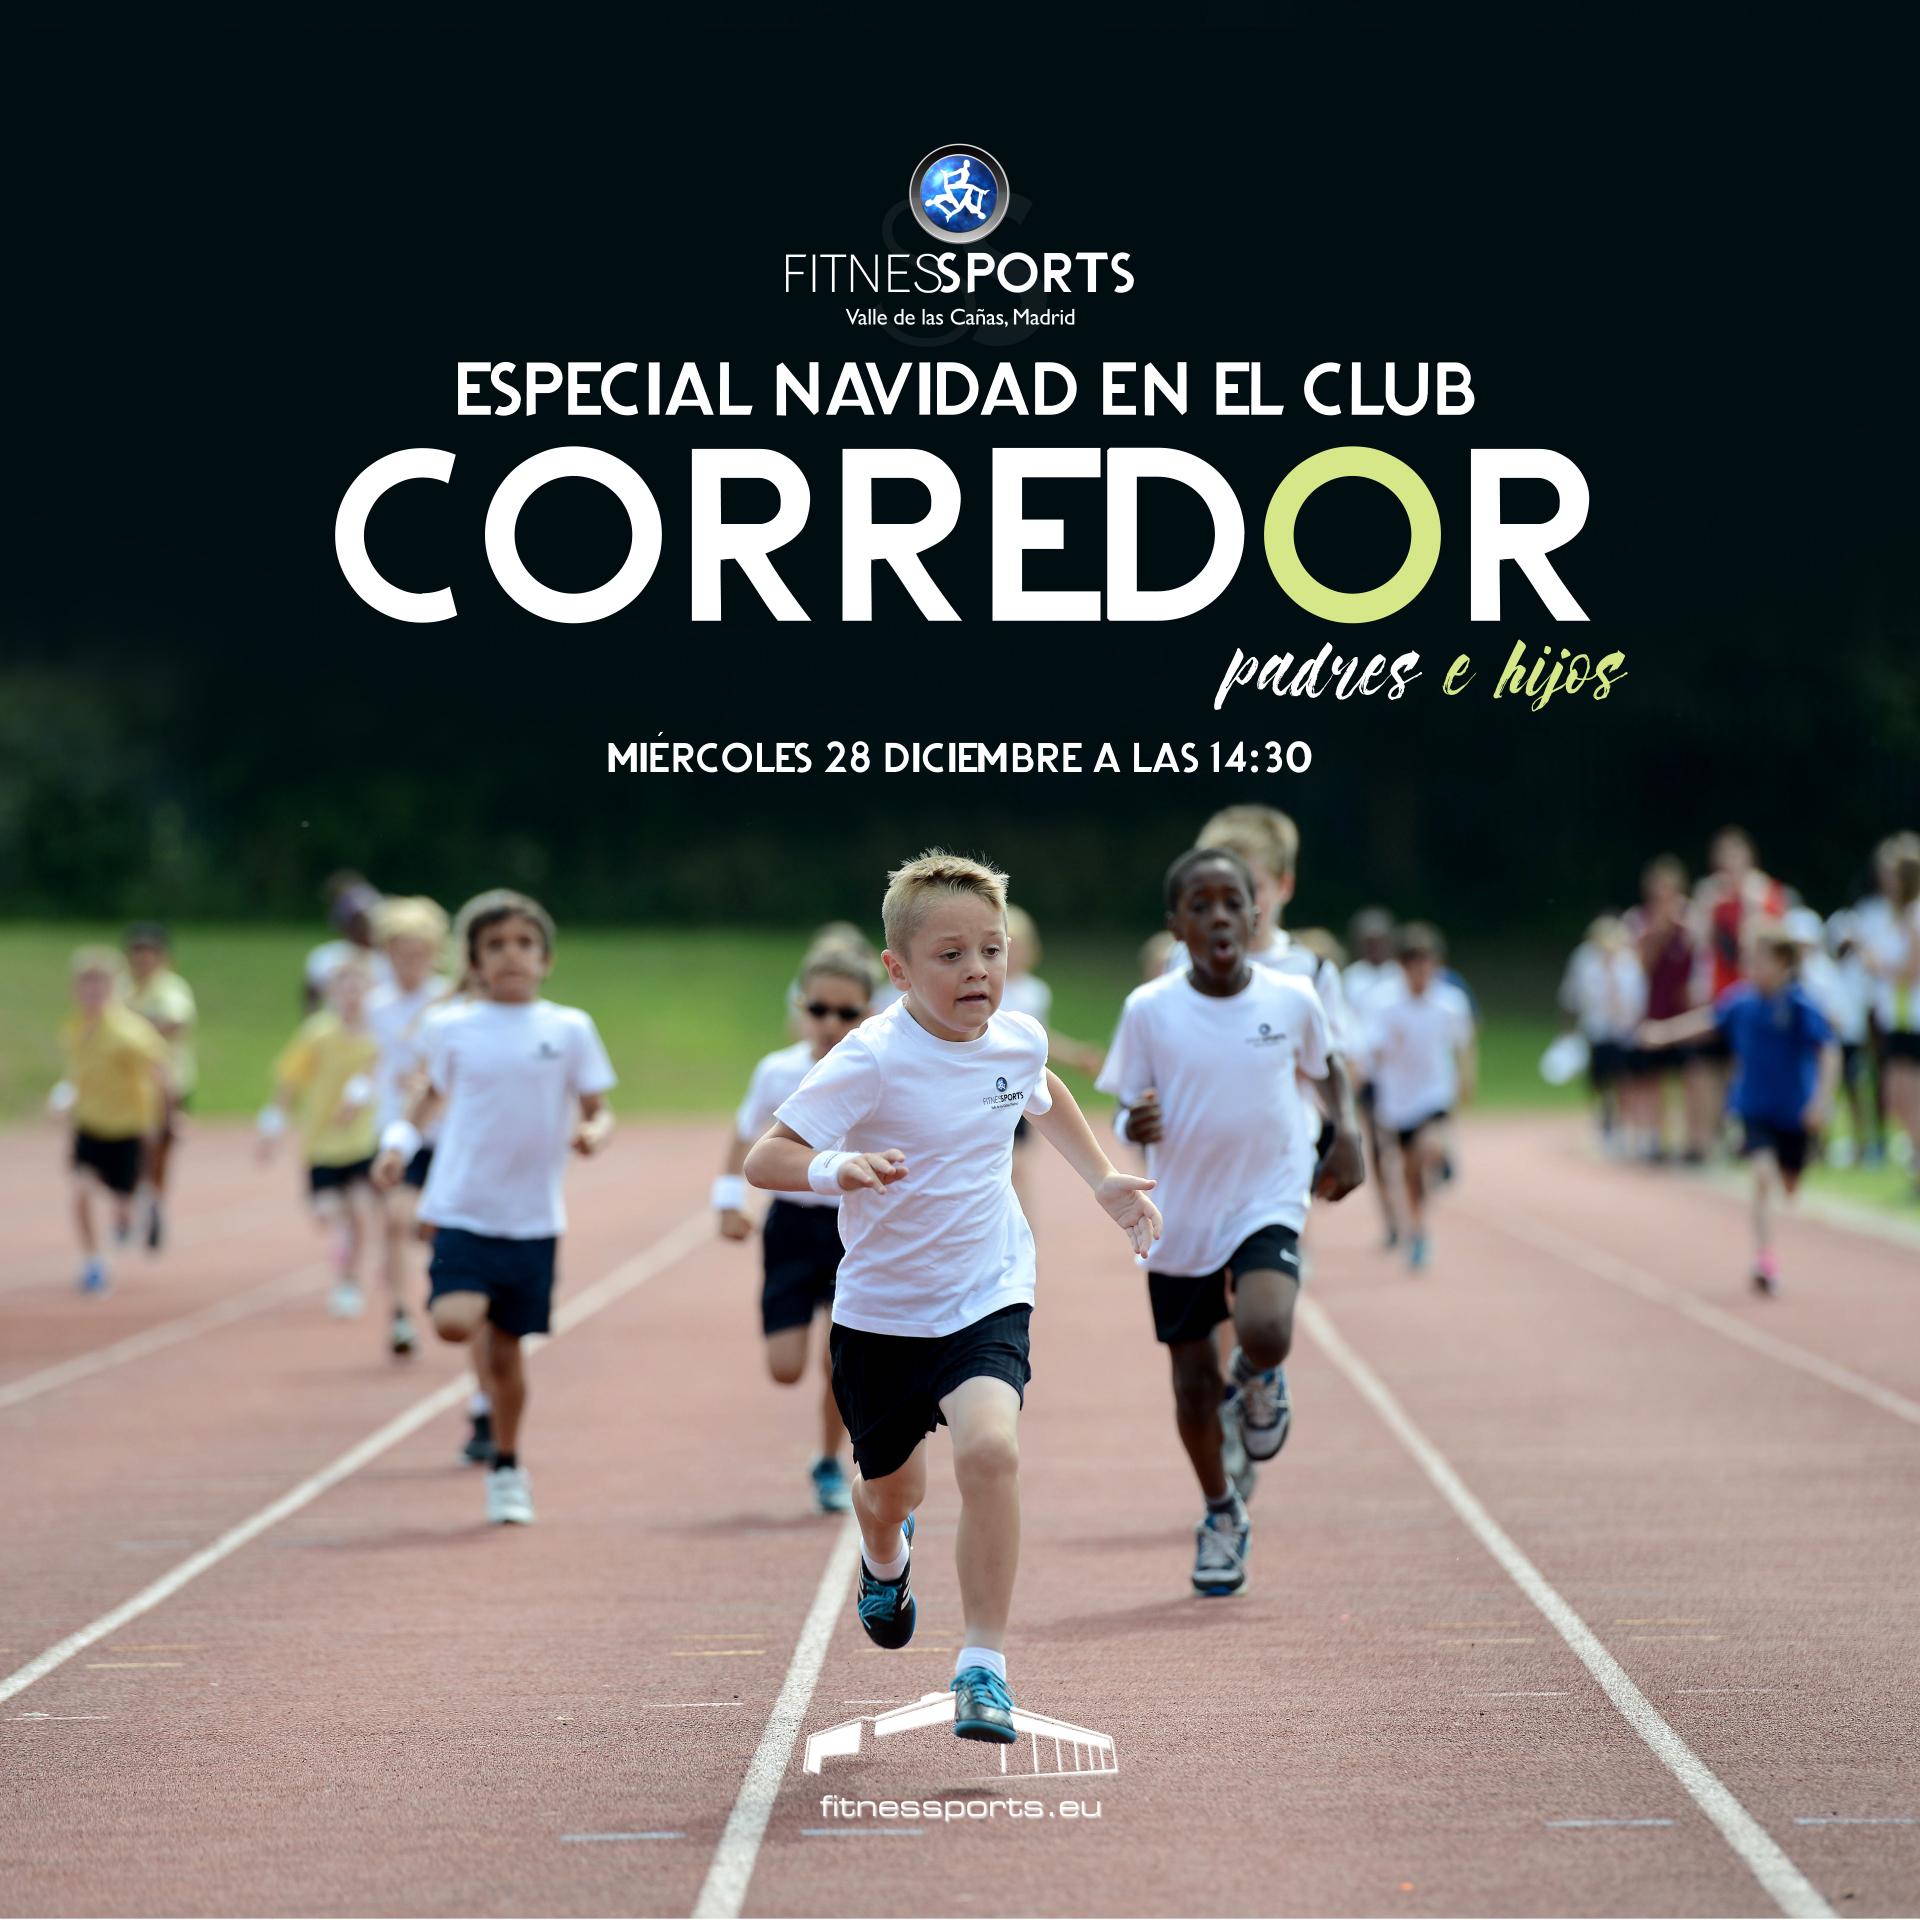 corredor-especial-navidad-runners